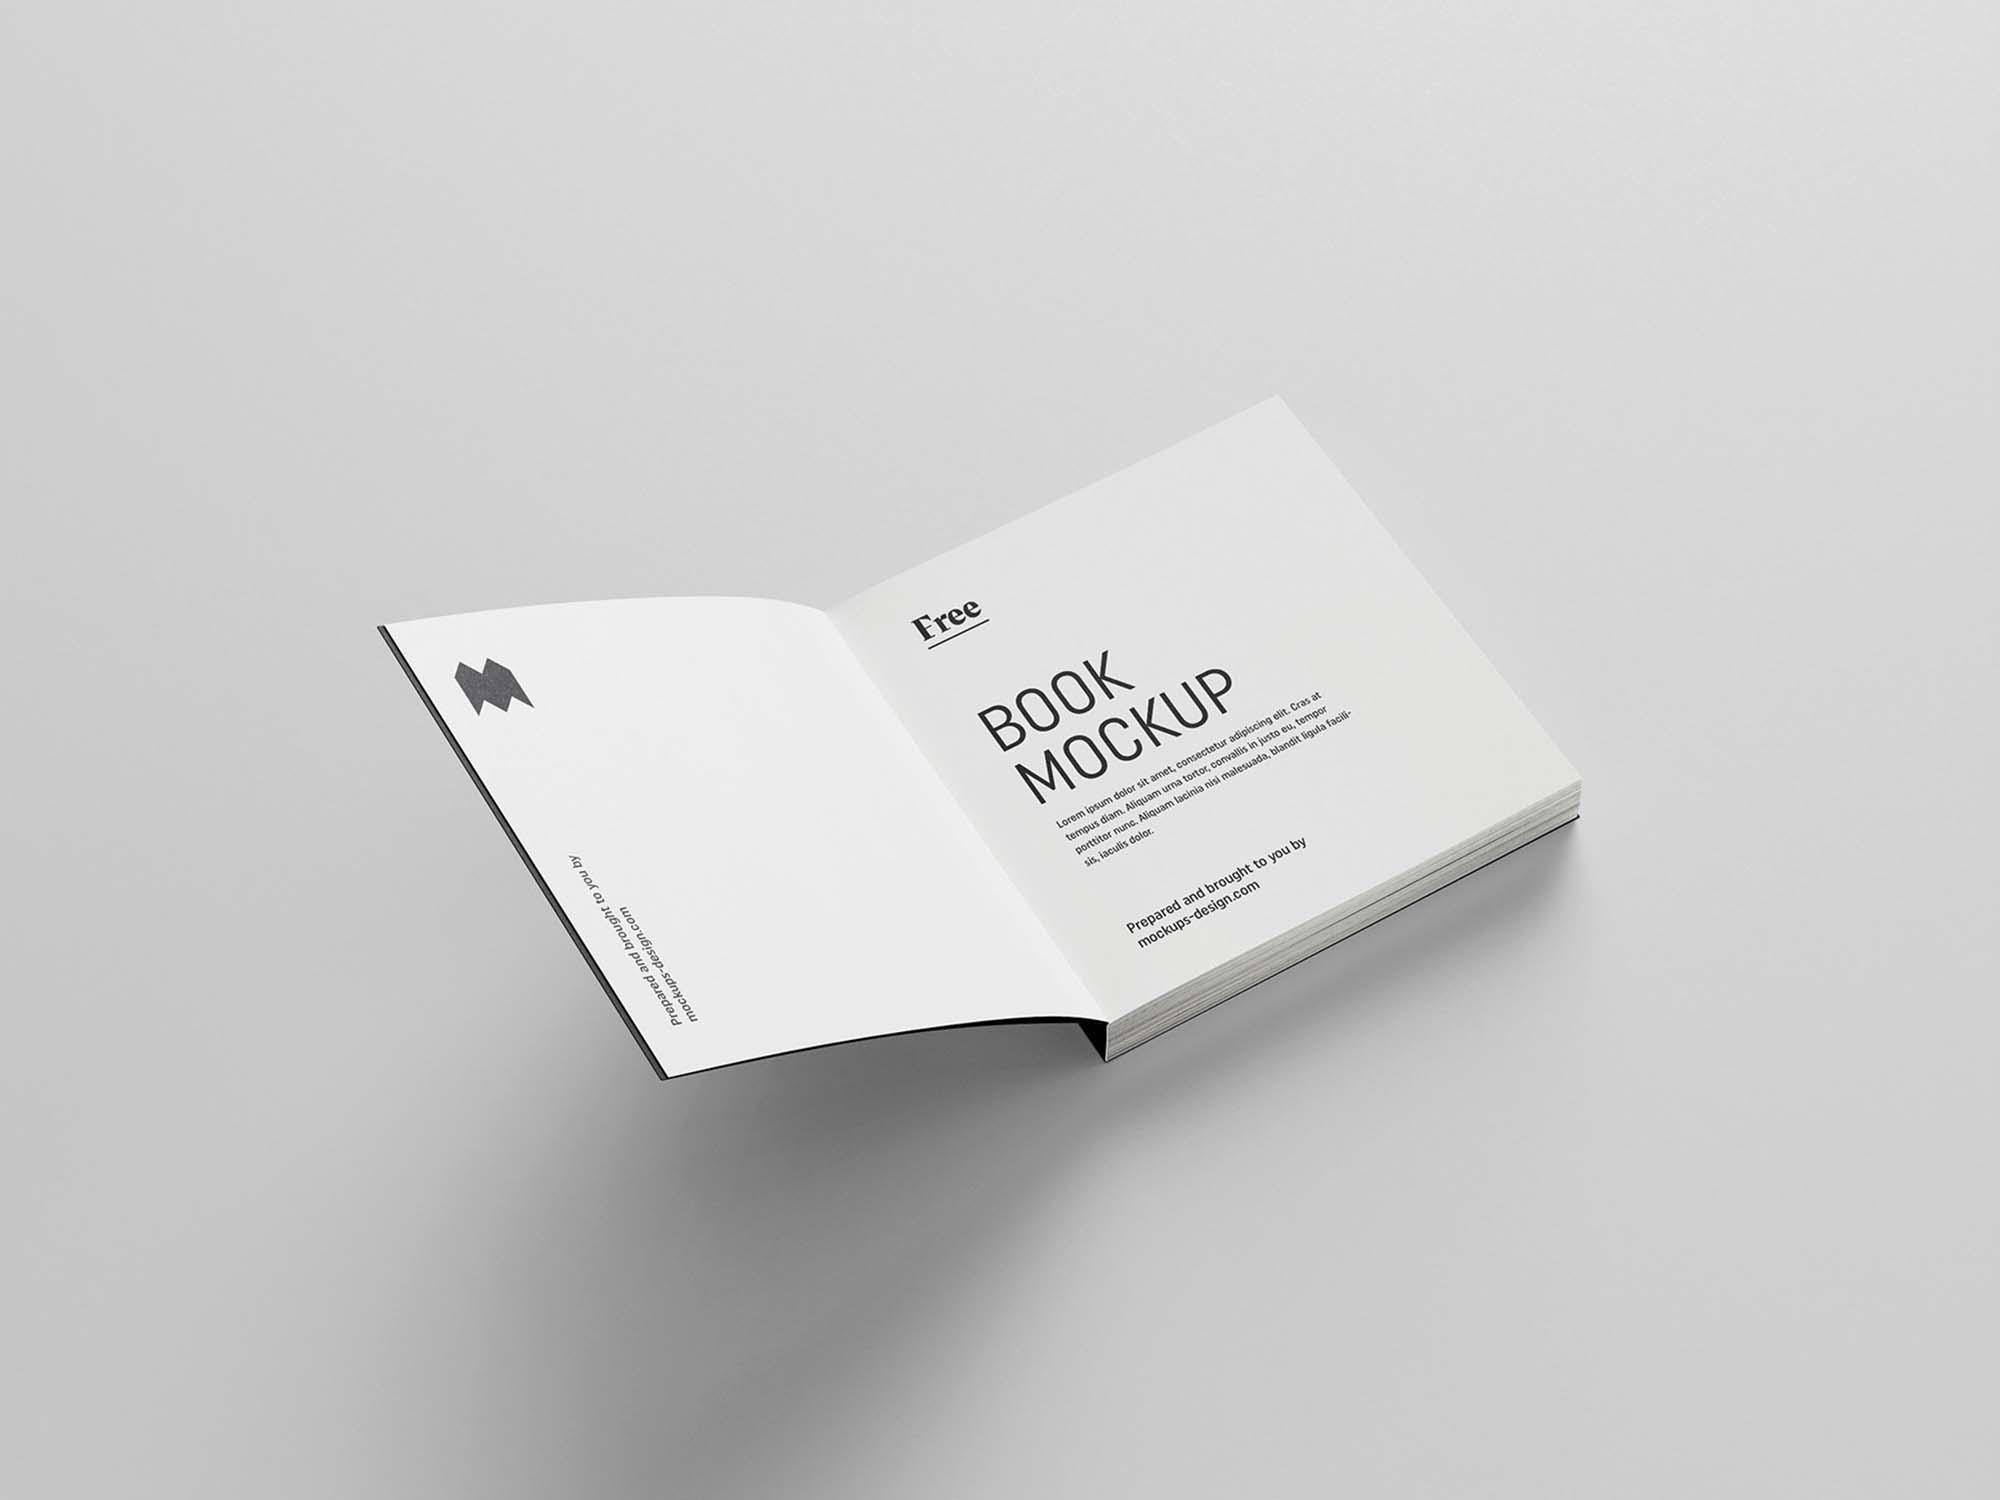 Square Book Mockup 4